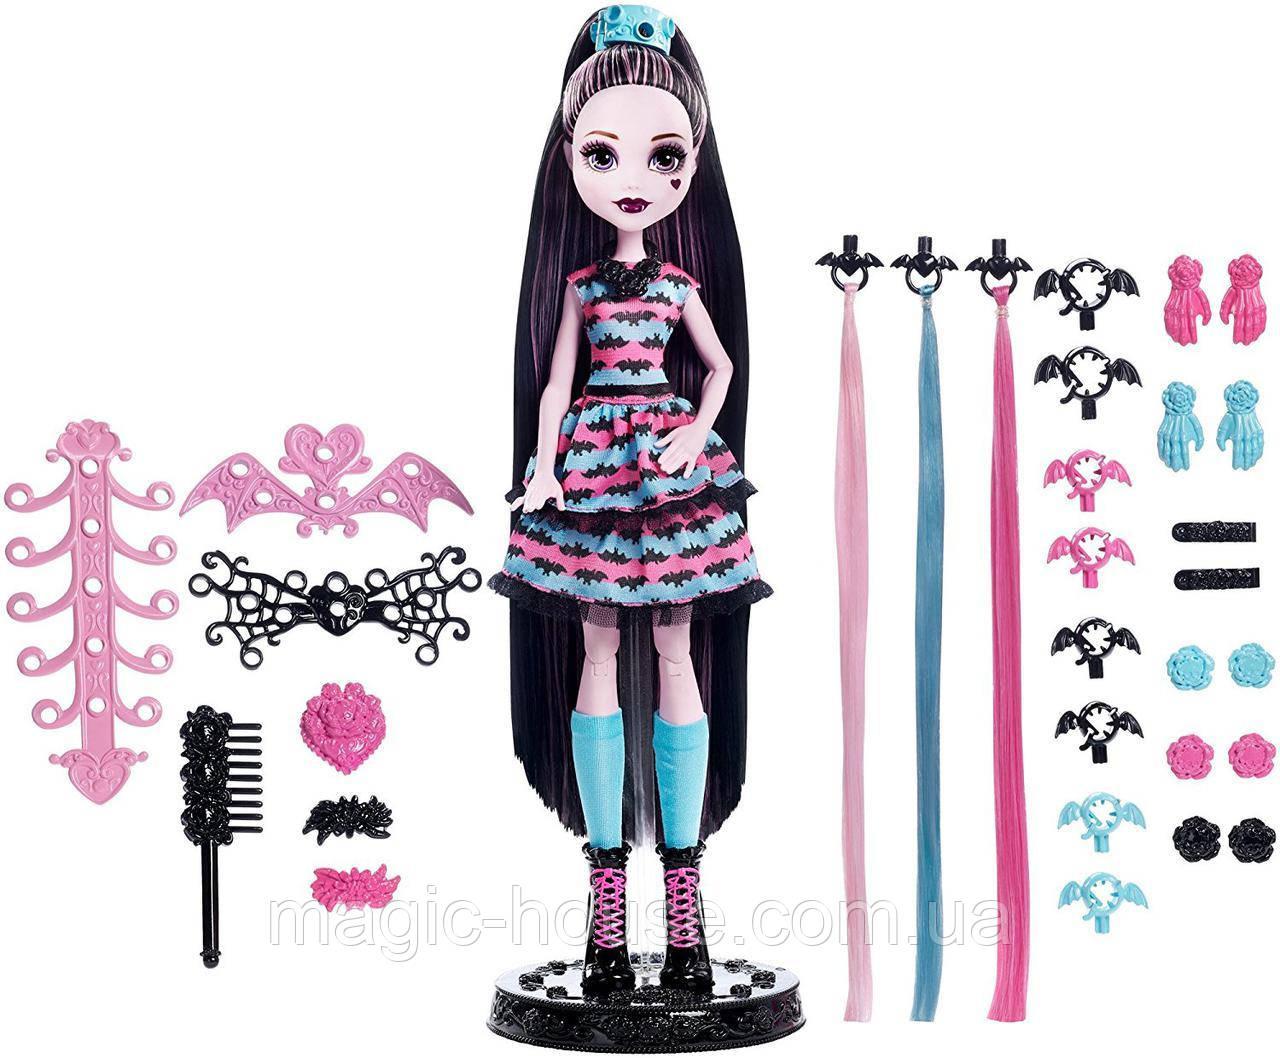 Monster High Girls Party Hair Draculaura Doll Кукла Монстер Хай Дракулаура Вечеринка причесок